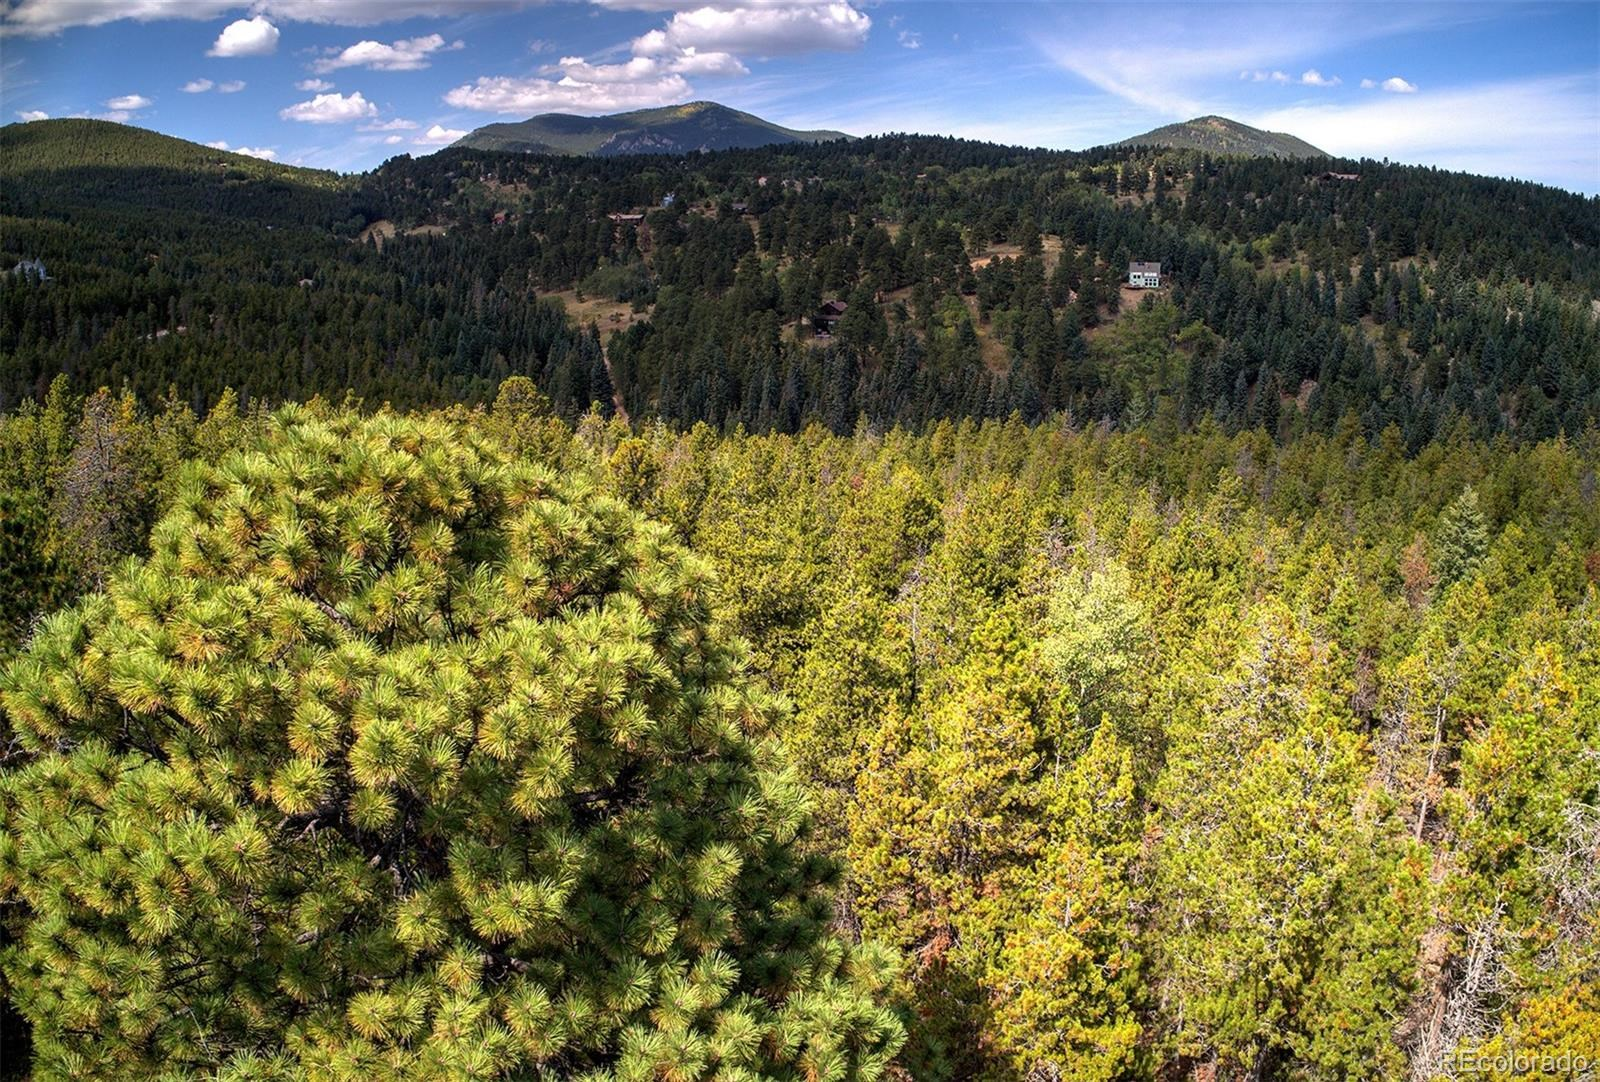 MLS# 2193114 - 8 - 1 Mountain Estate Drive, Evergreen, CO 80439